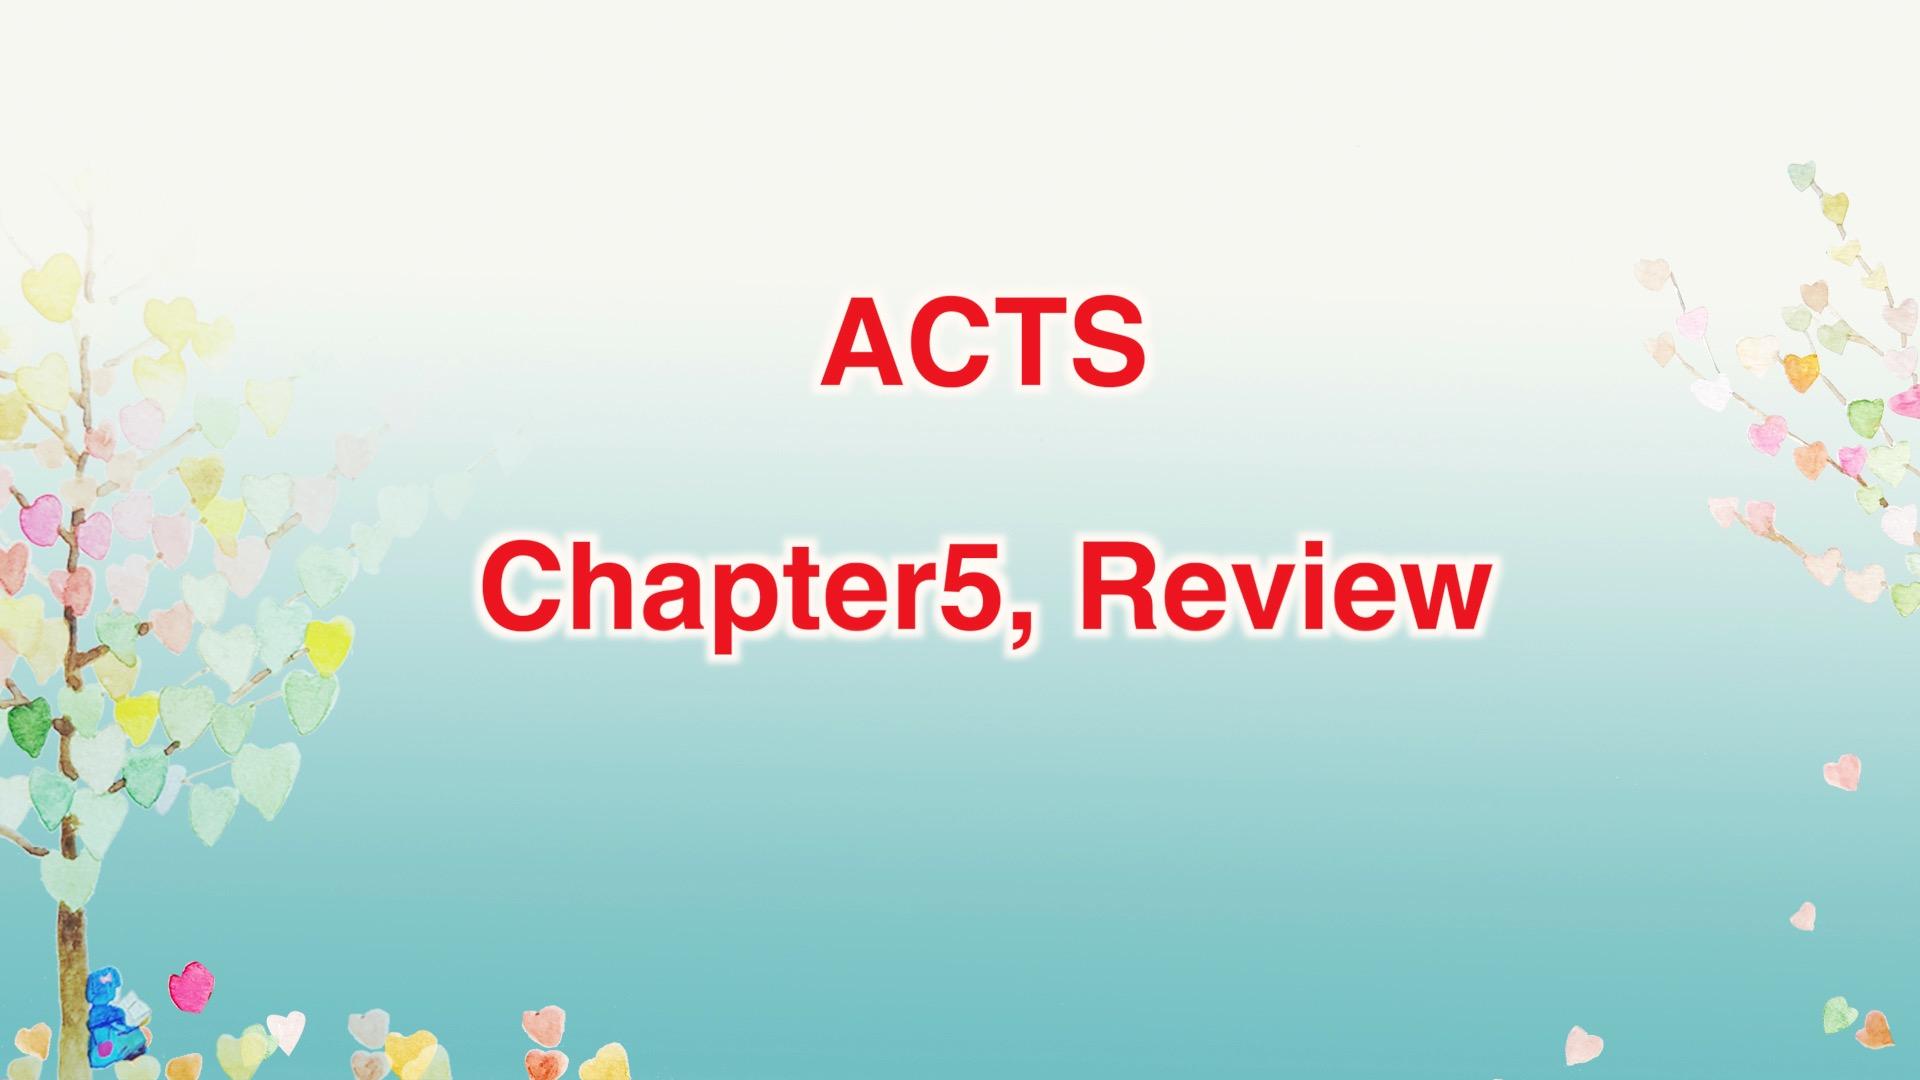 Leena's Bible English-Acts Chap. 5 Review